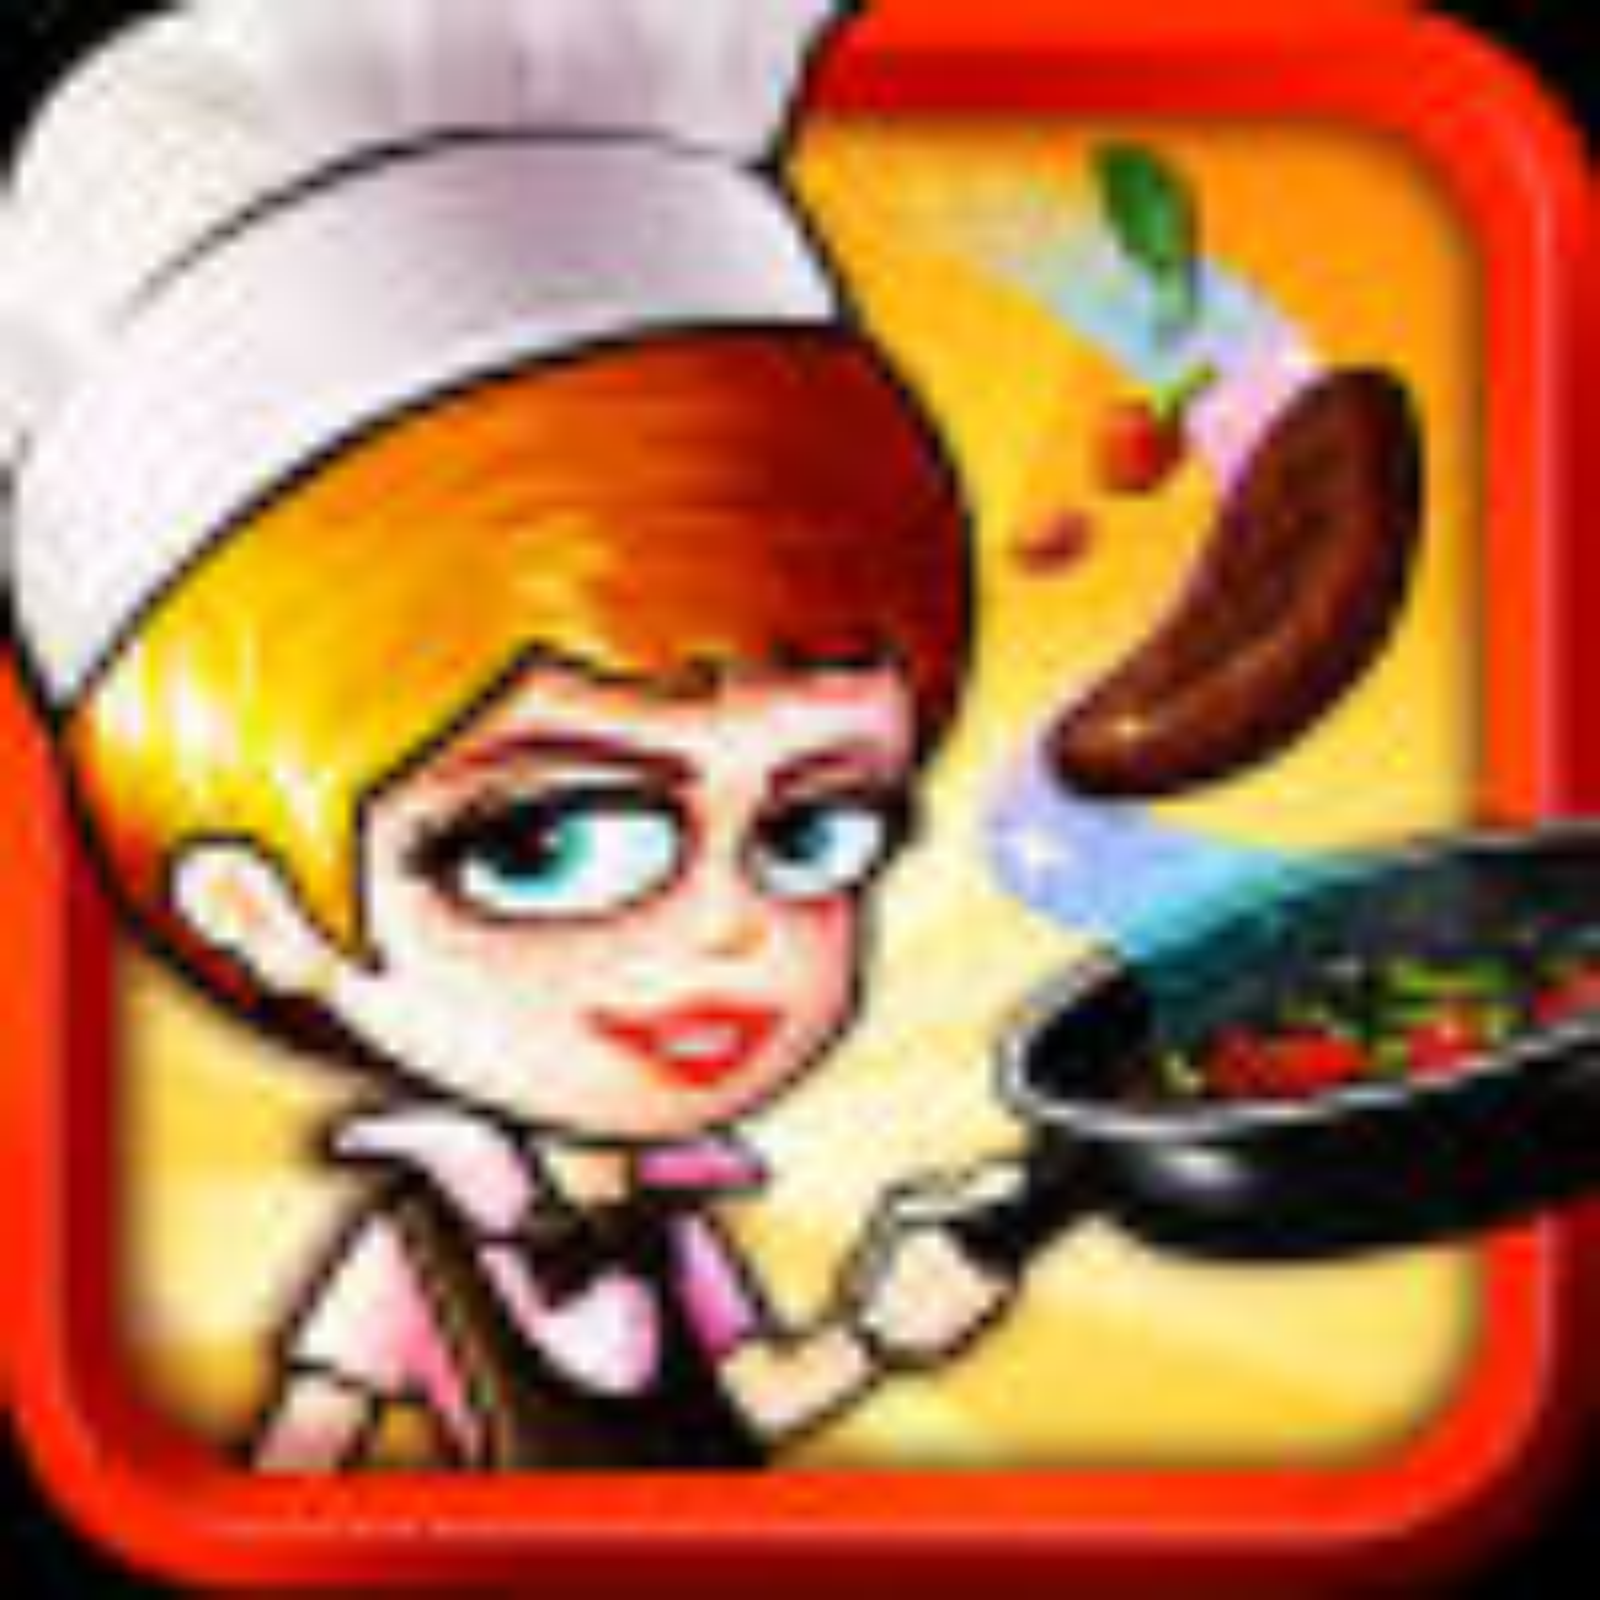 Estrela Chef - Star Chef 1.0.4